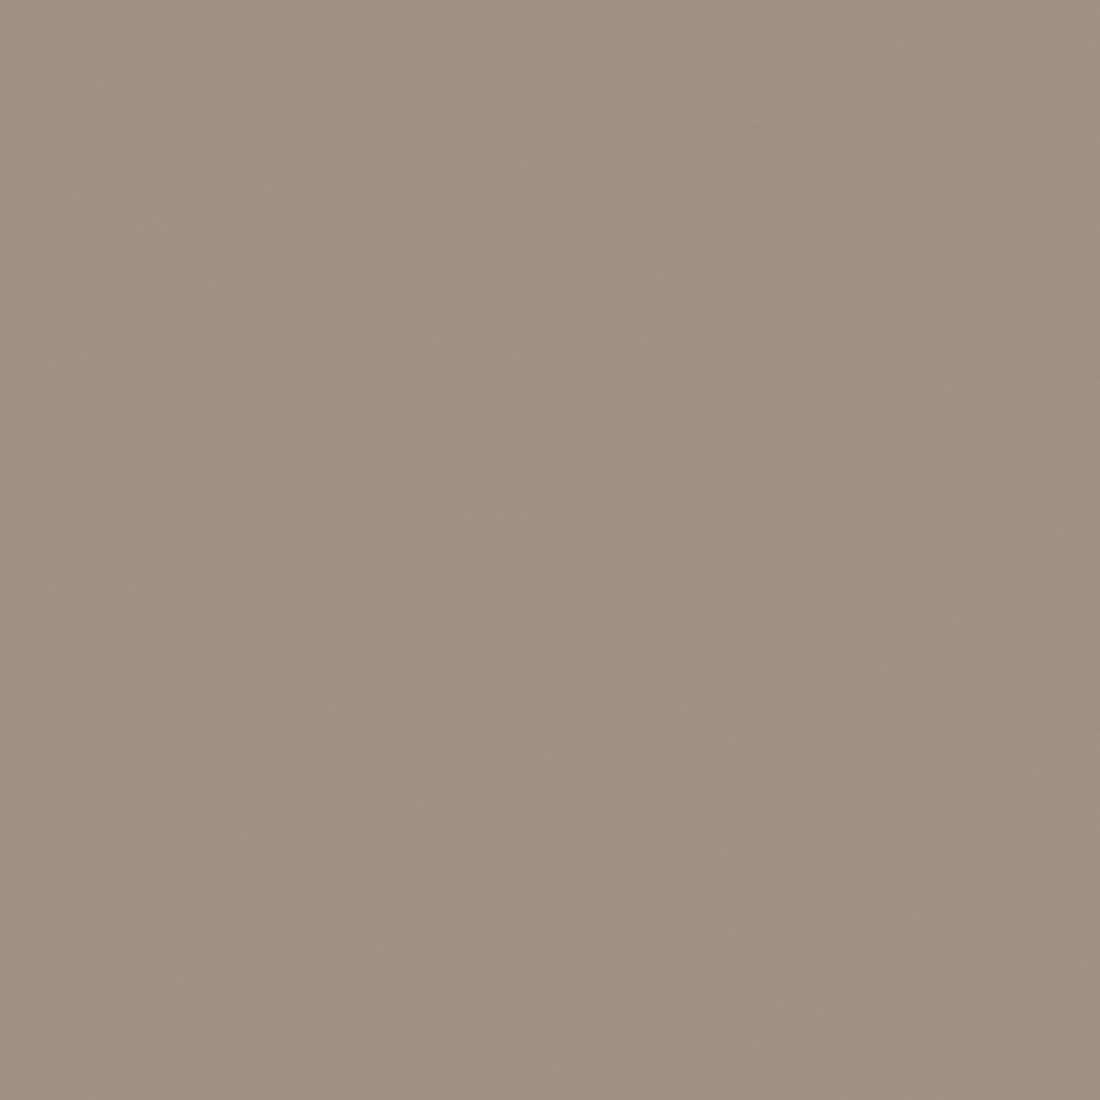 Глиняный Серый